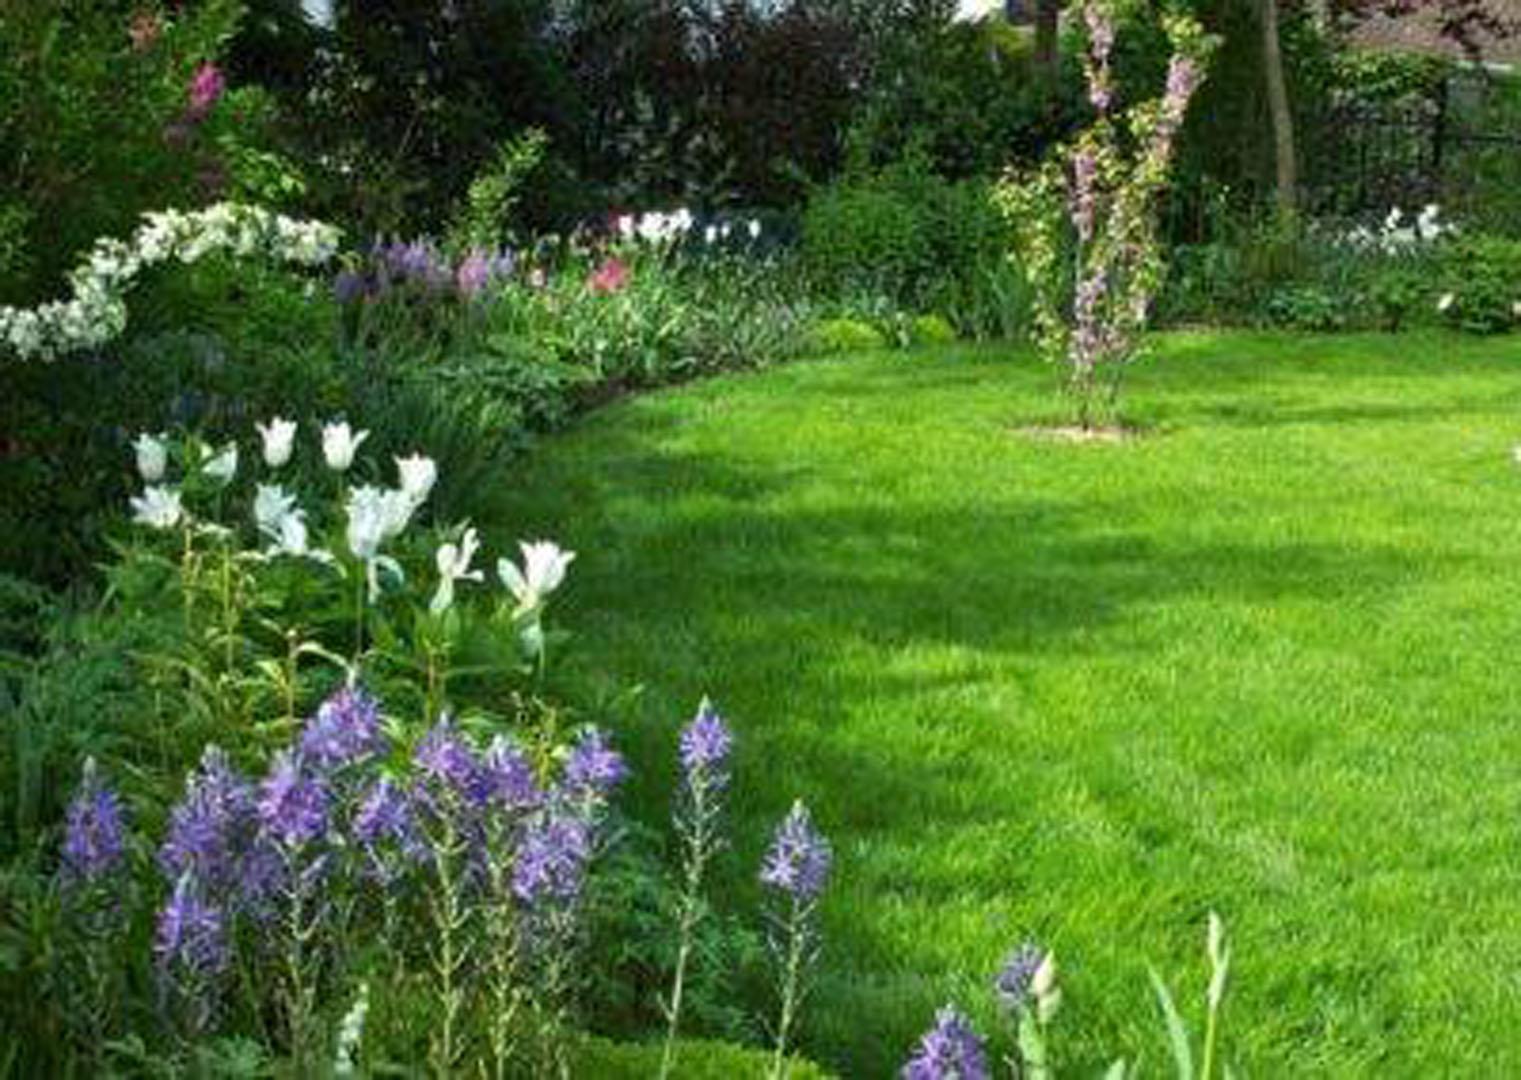 Dessine-moi mon jardin